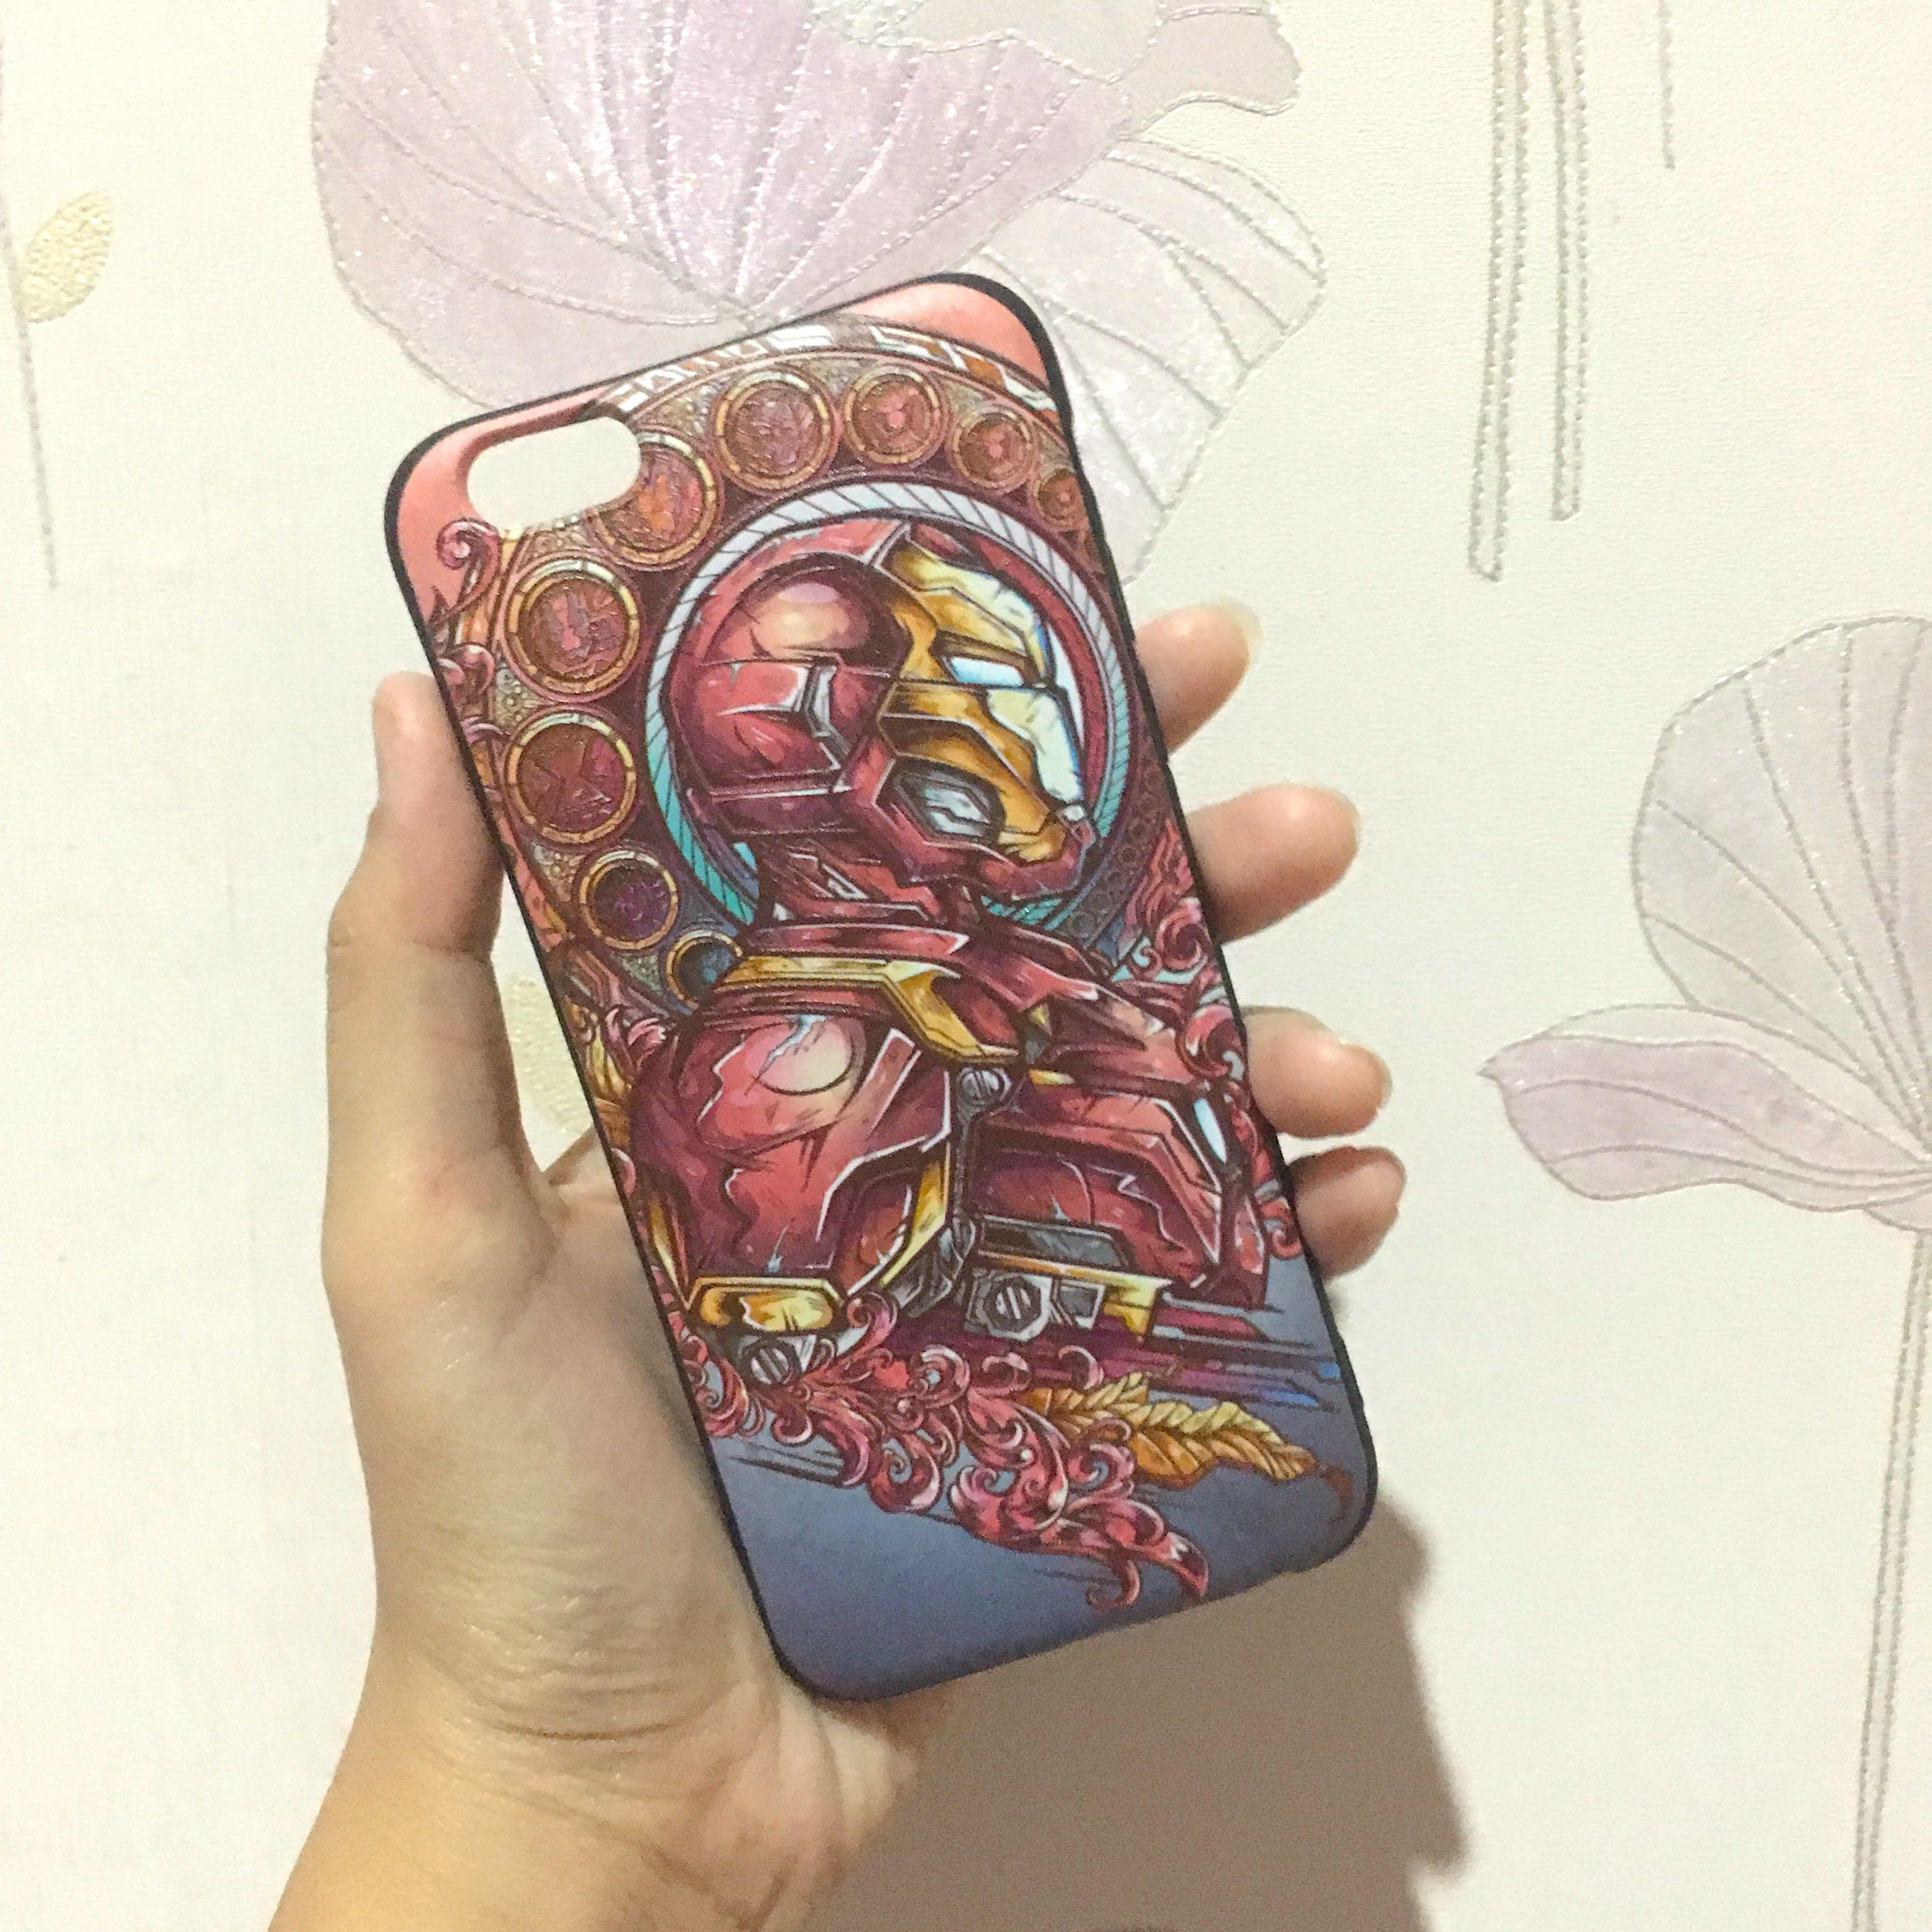 New iPhone 6 6s Case iron man avengers